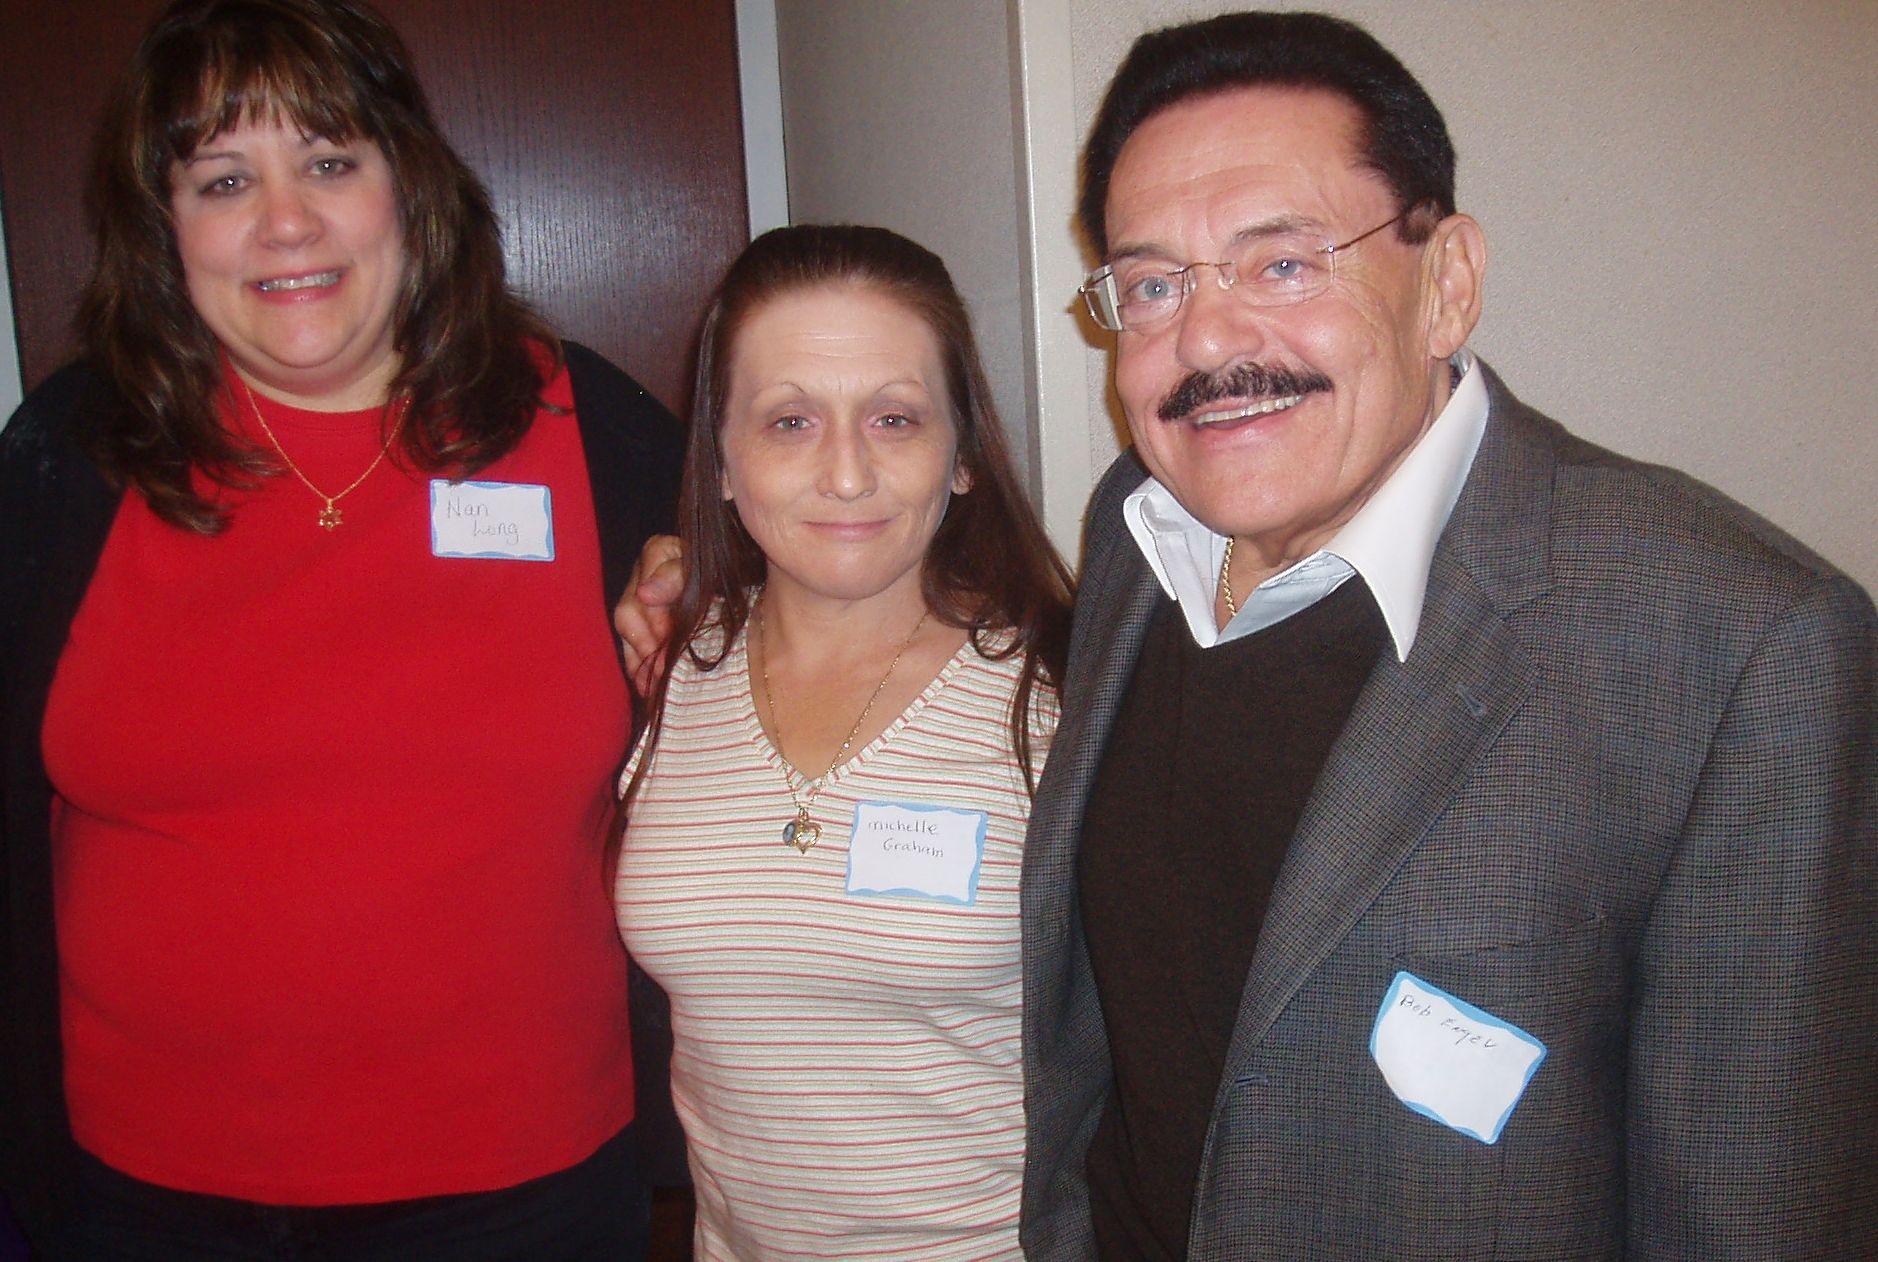 Nan Long, Michelle Graham & Bob Engel